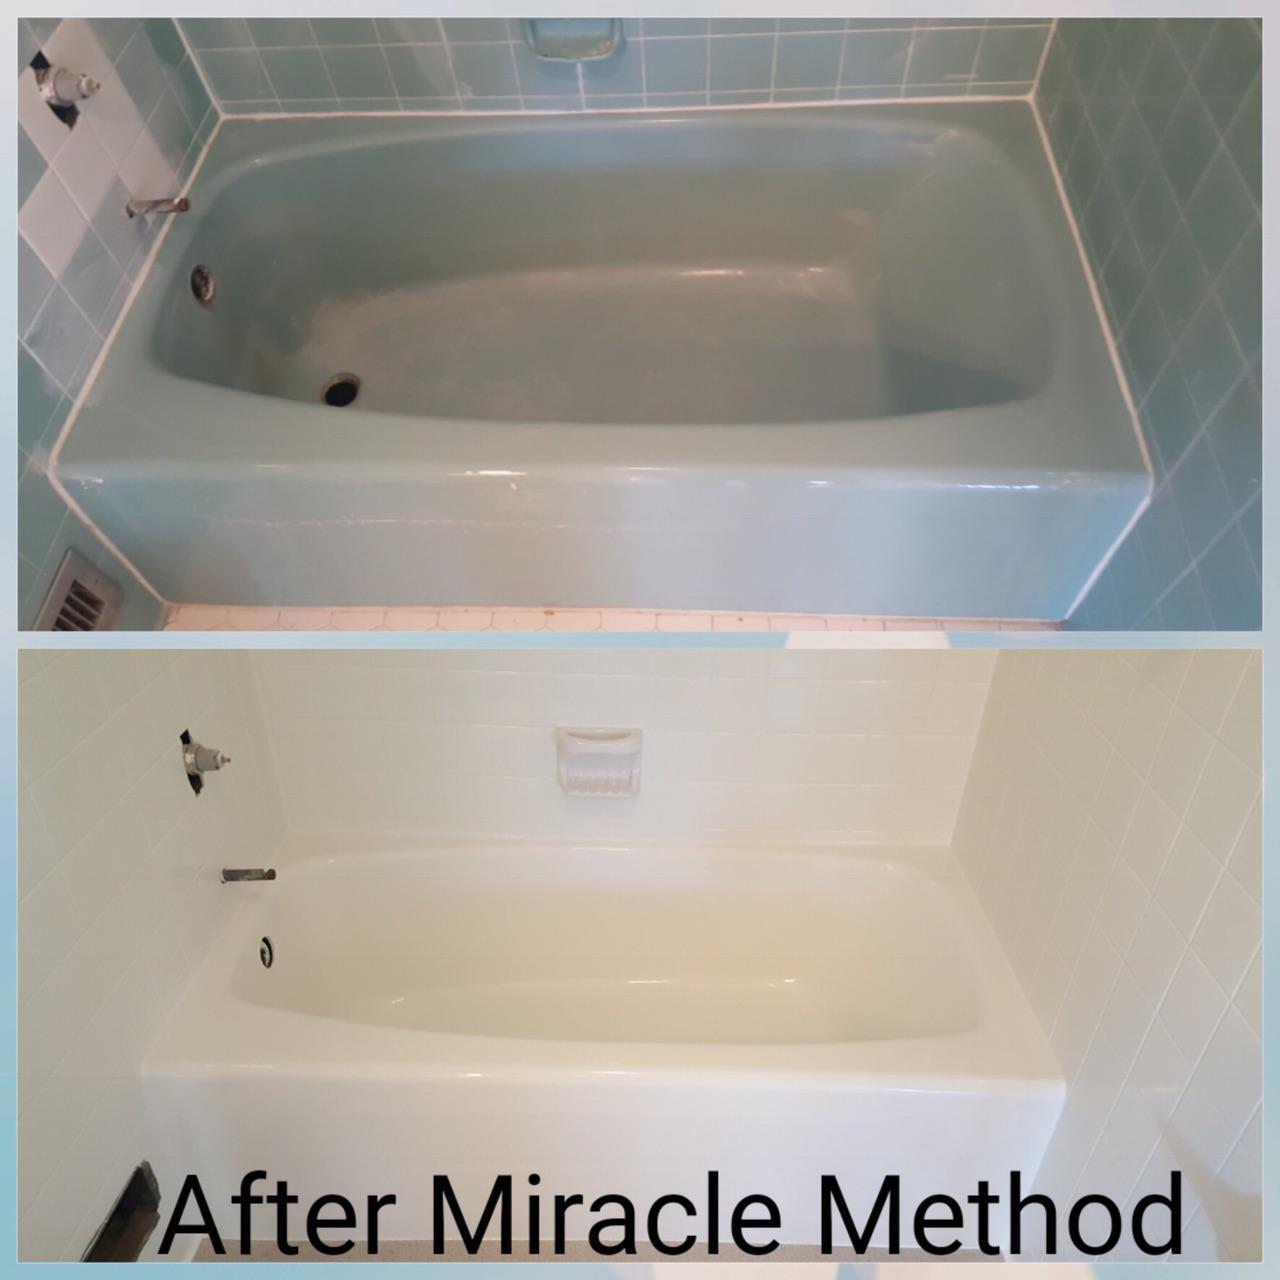 Miracle Method image 6